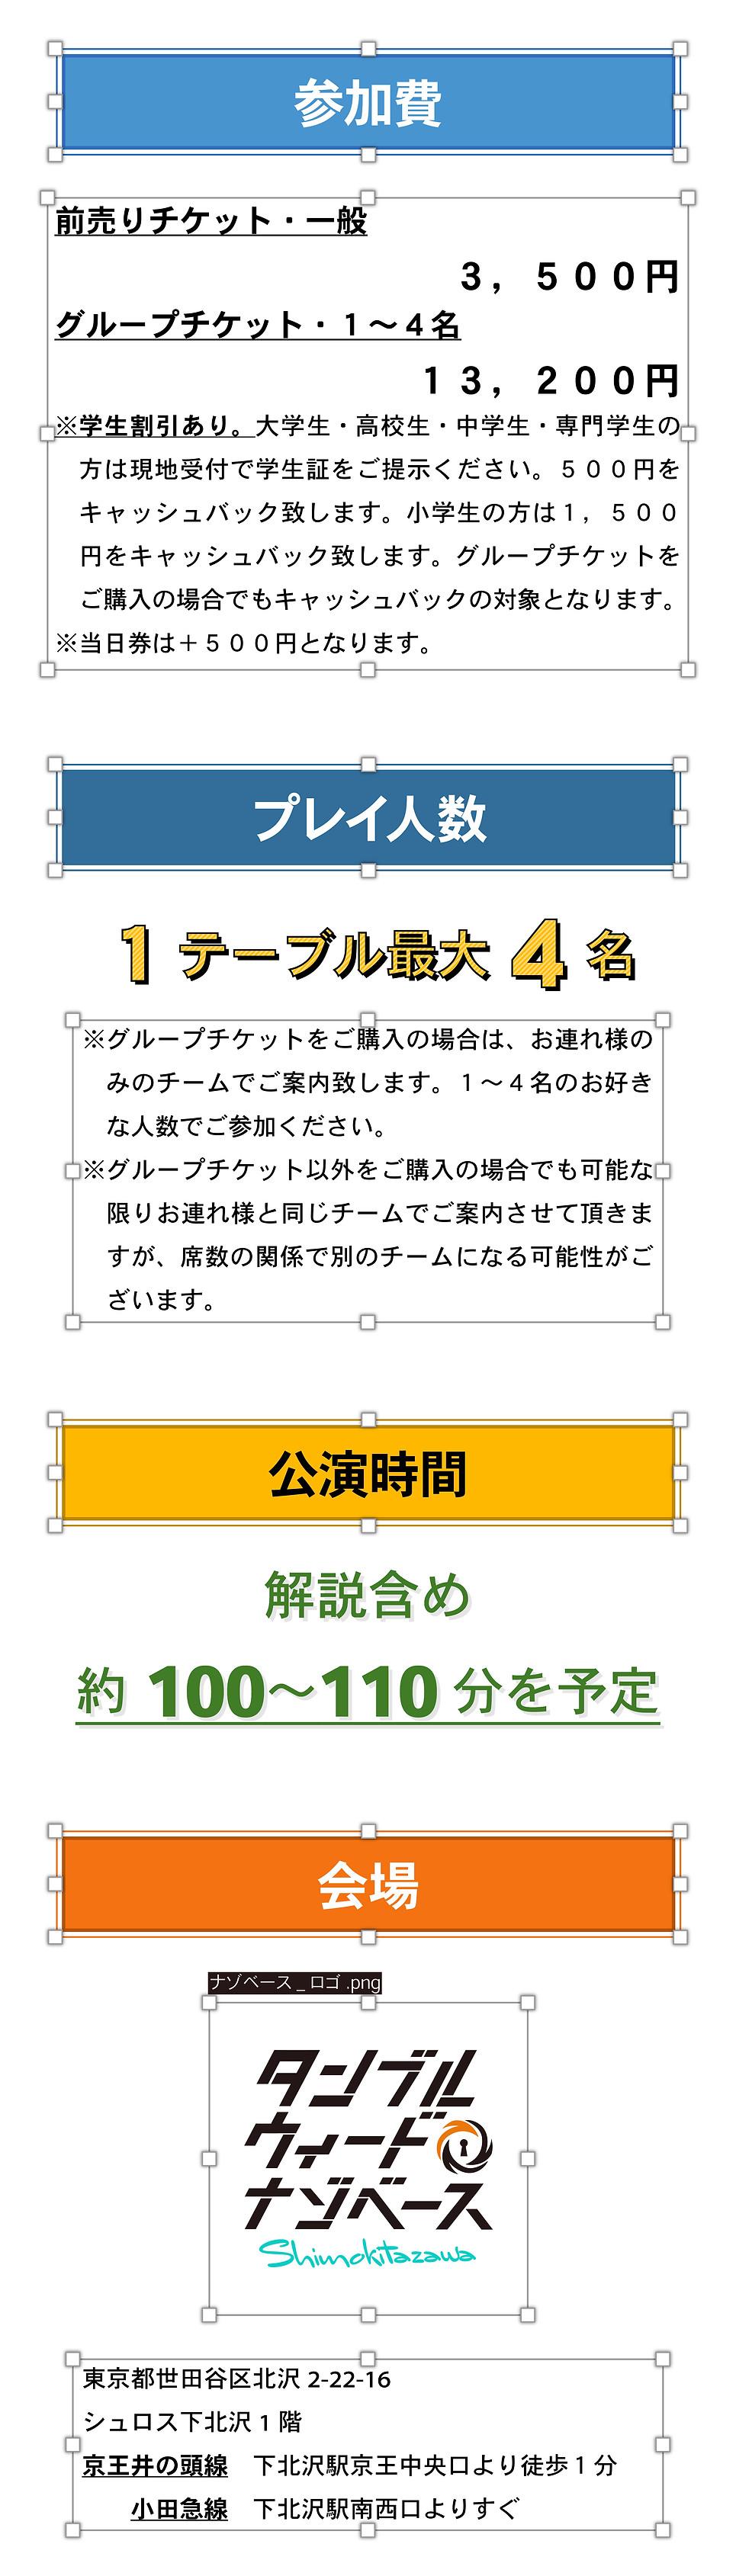 mikan_3.jpg